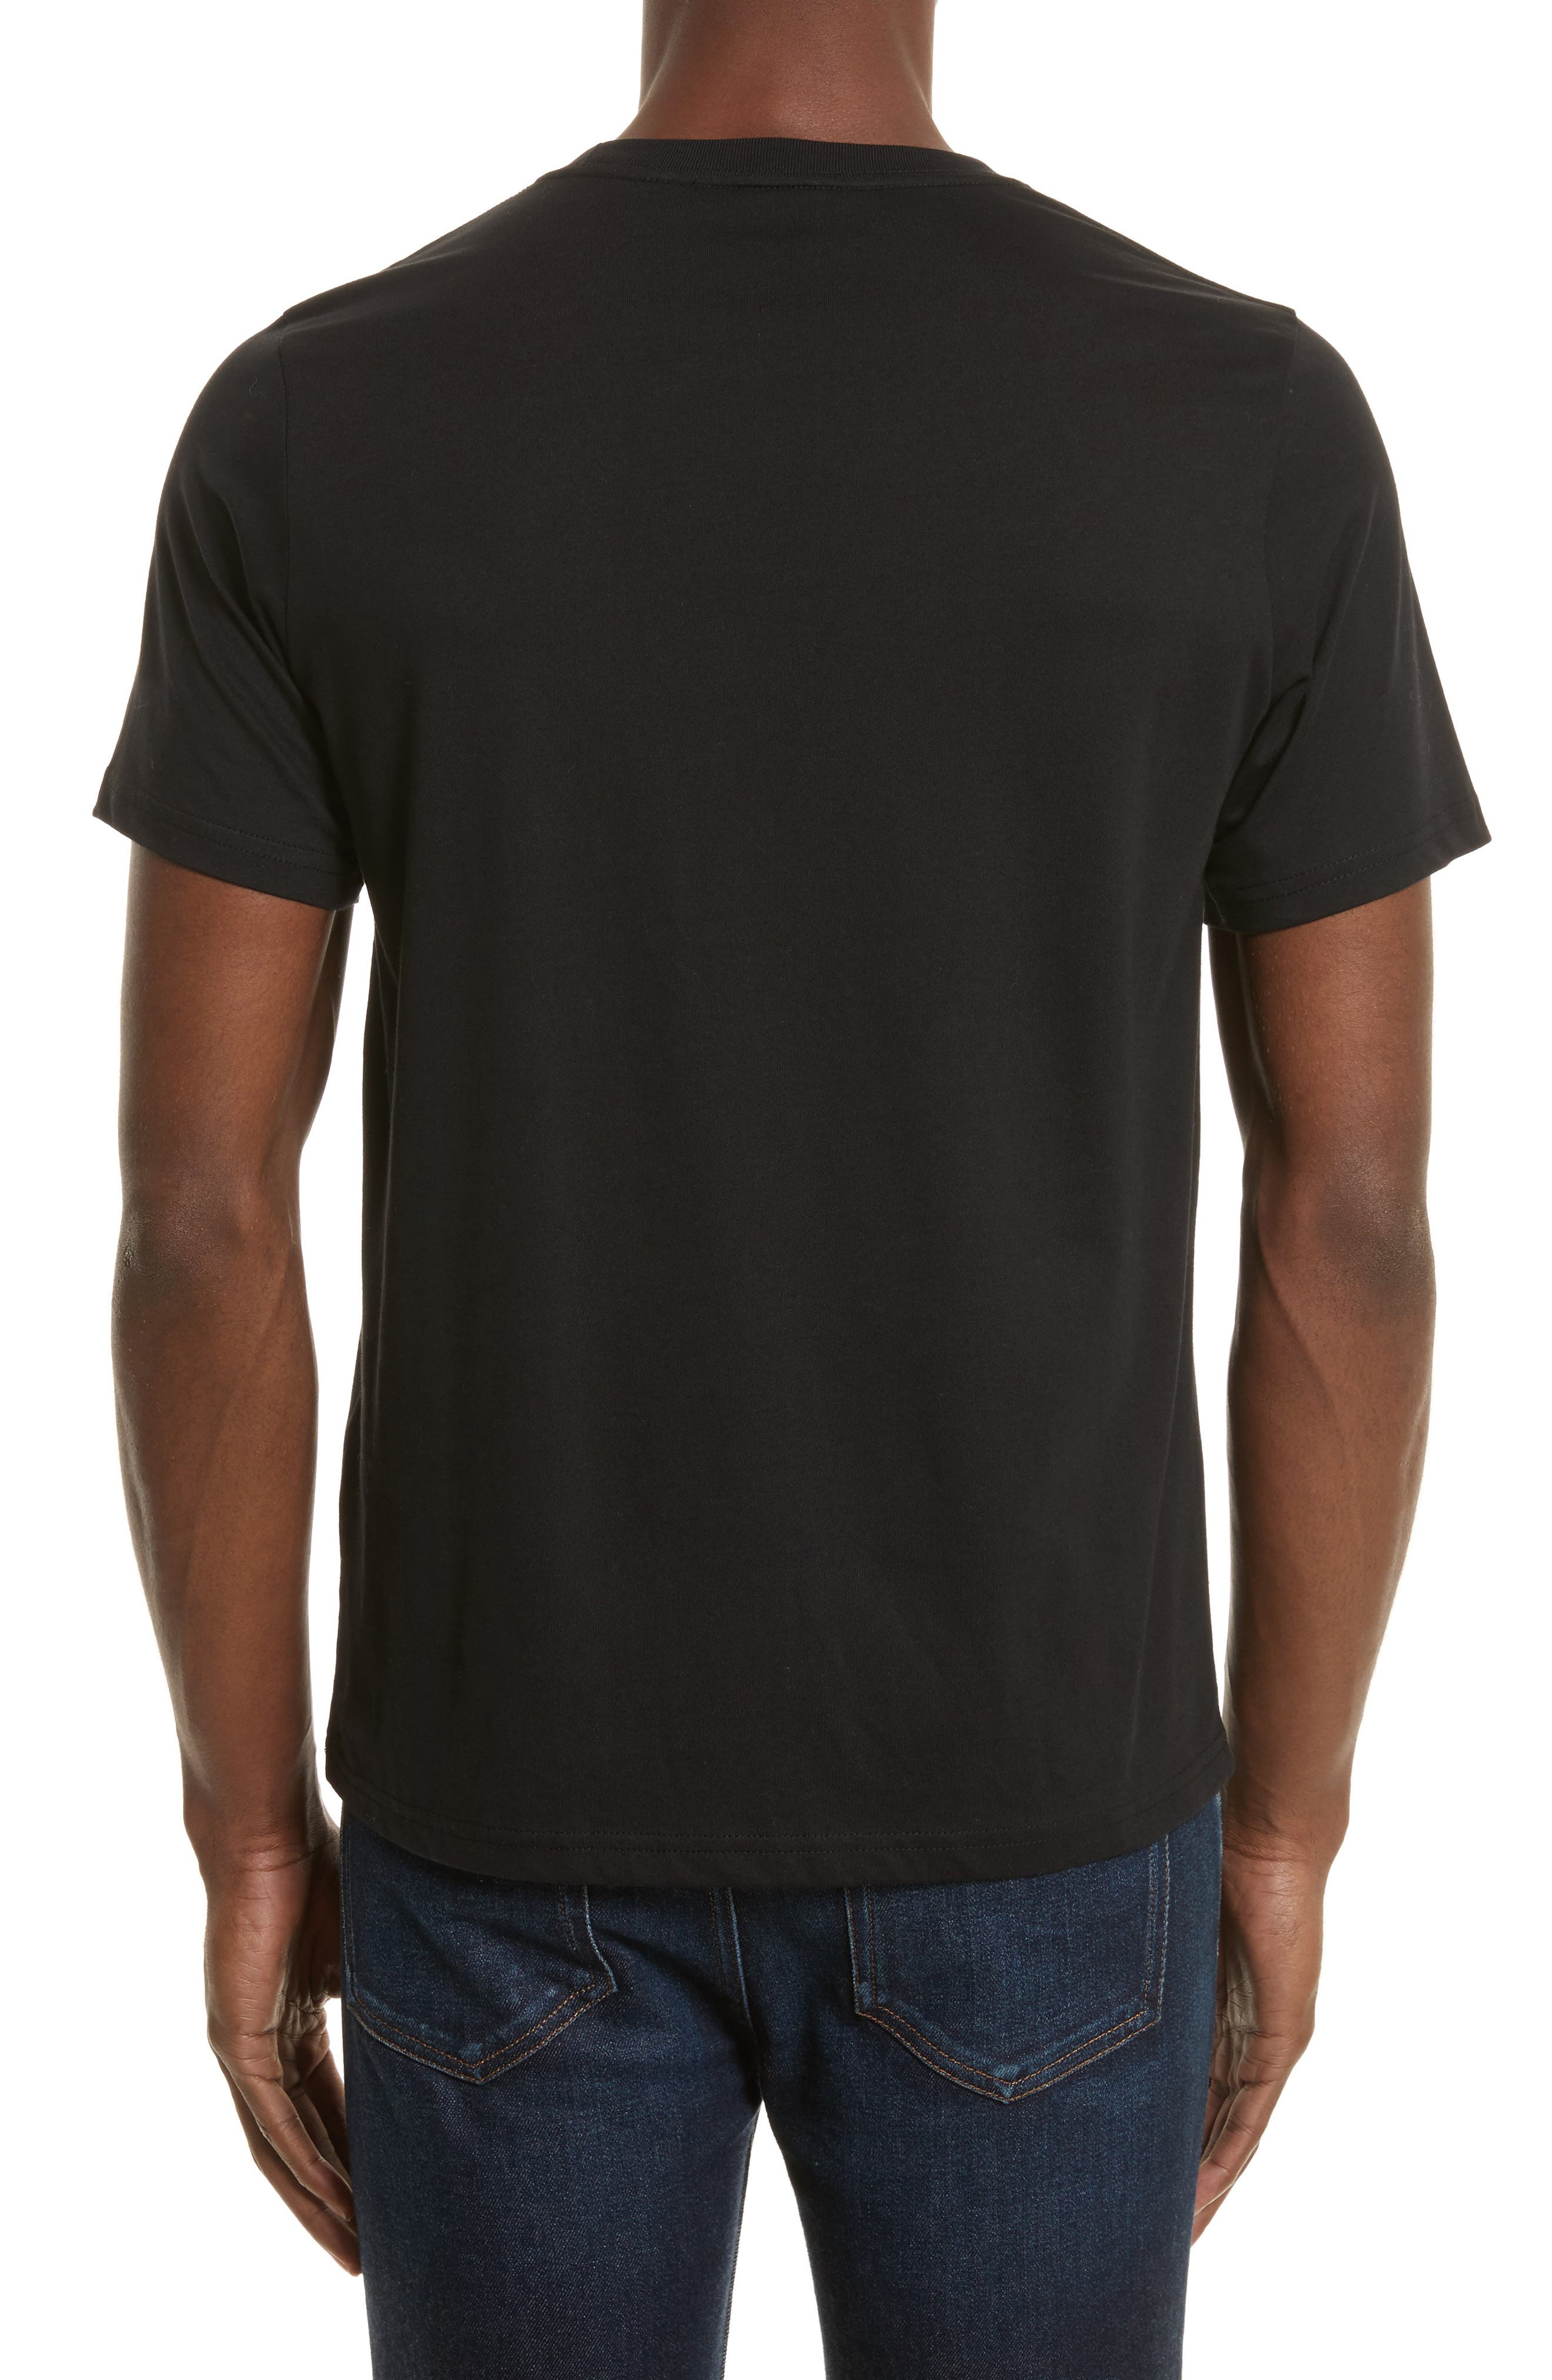 PS Graphic T-Shirt,                             Alternate thumbnail 2, color,                             Black